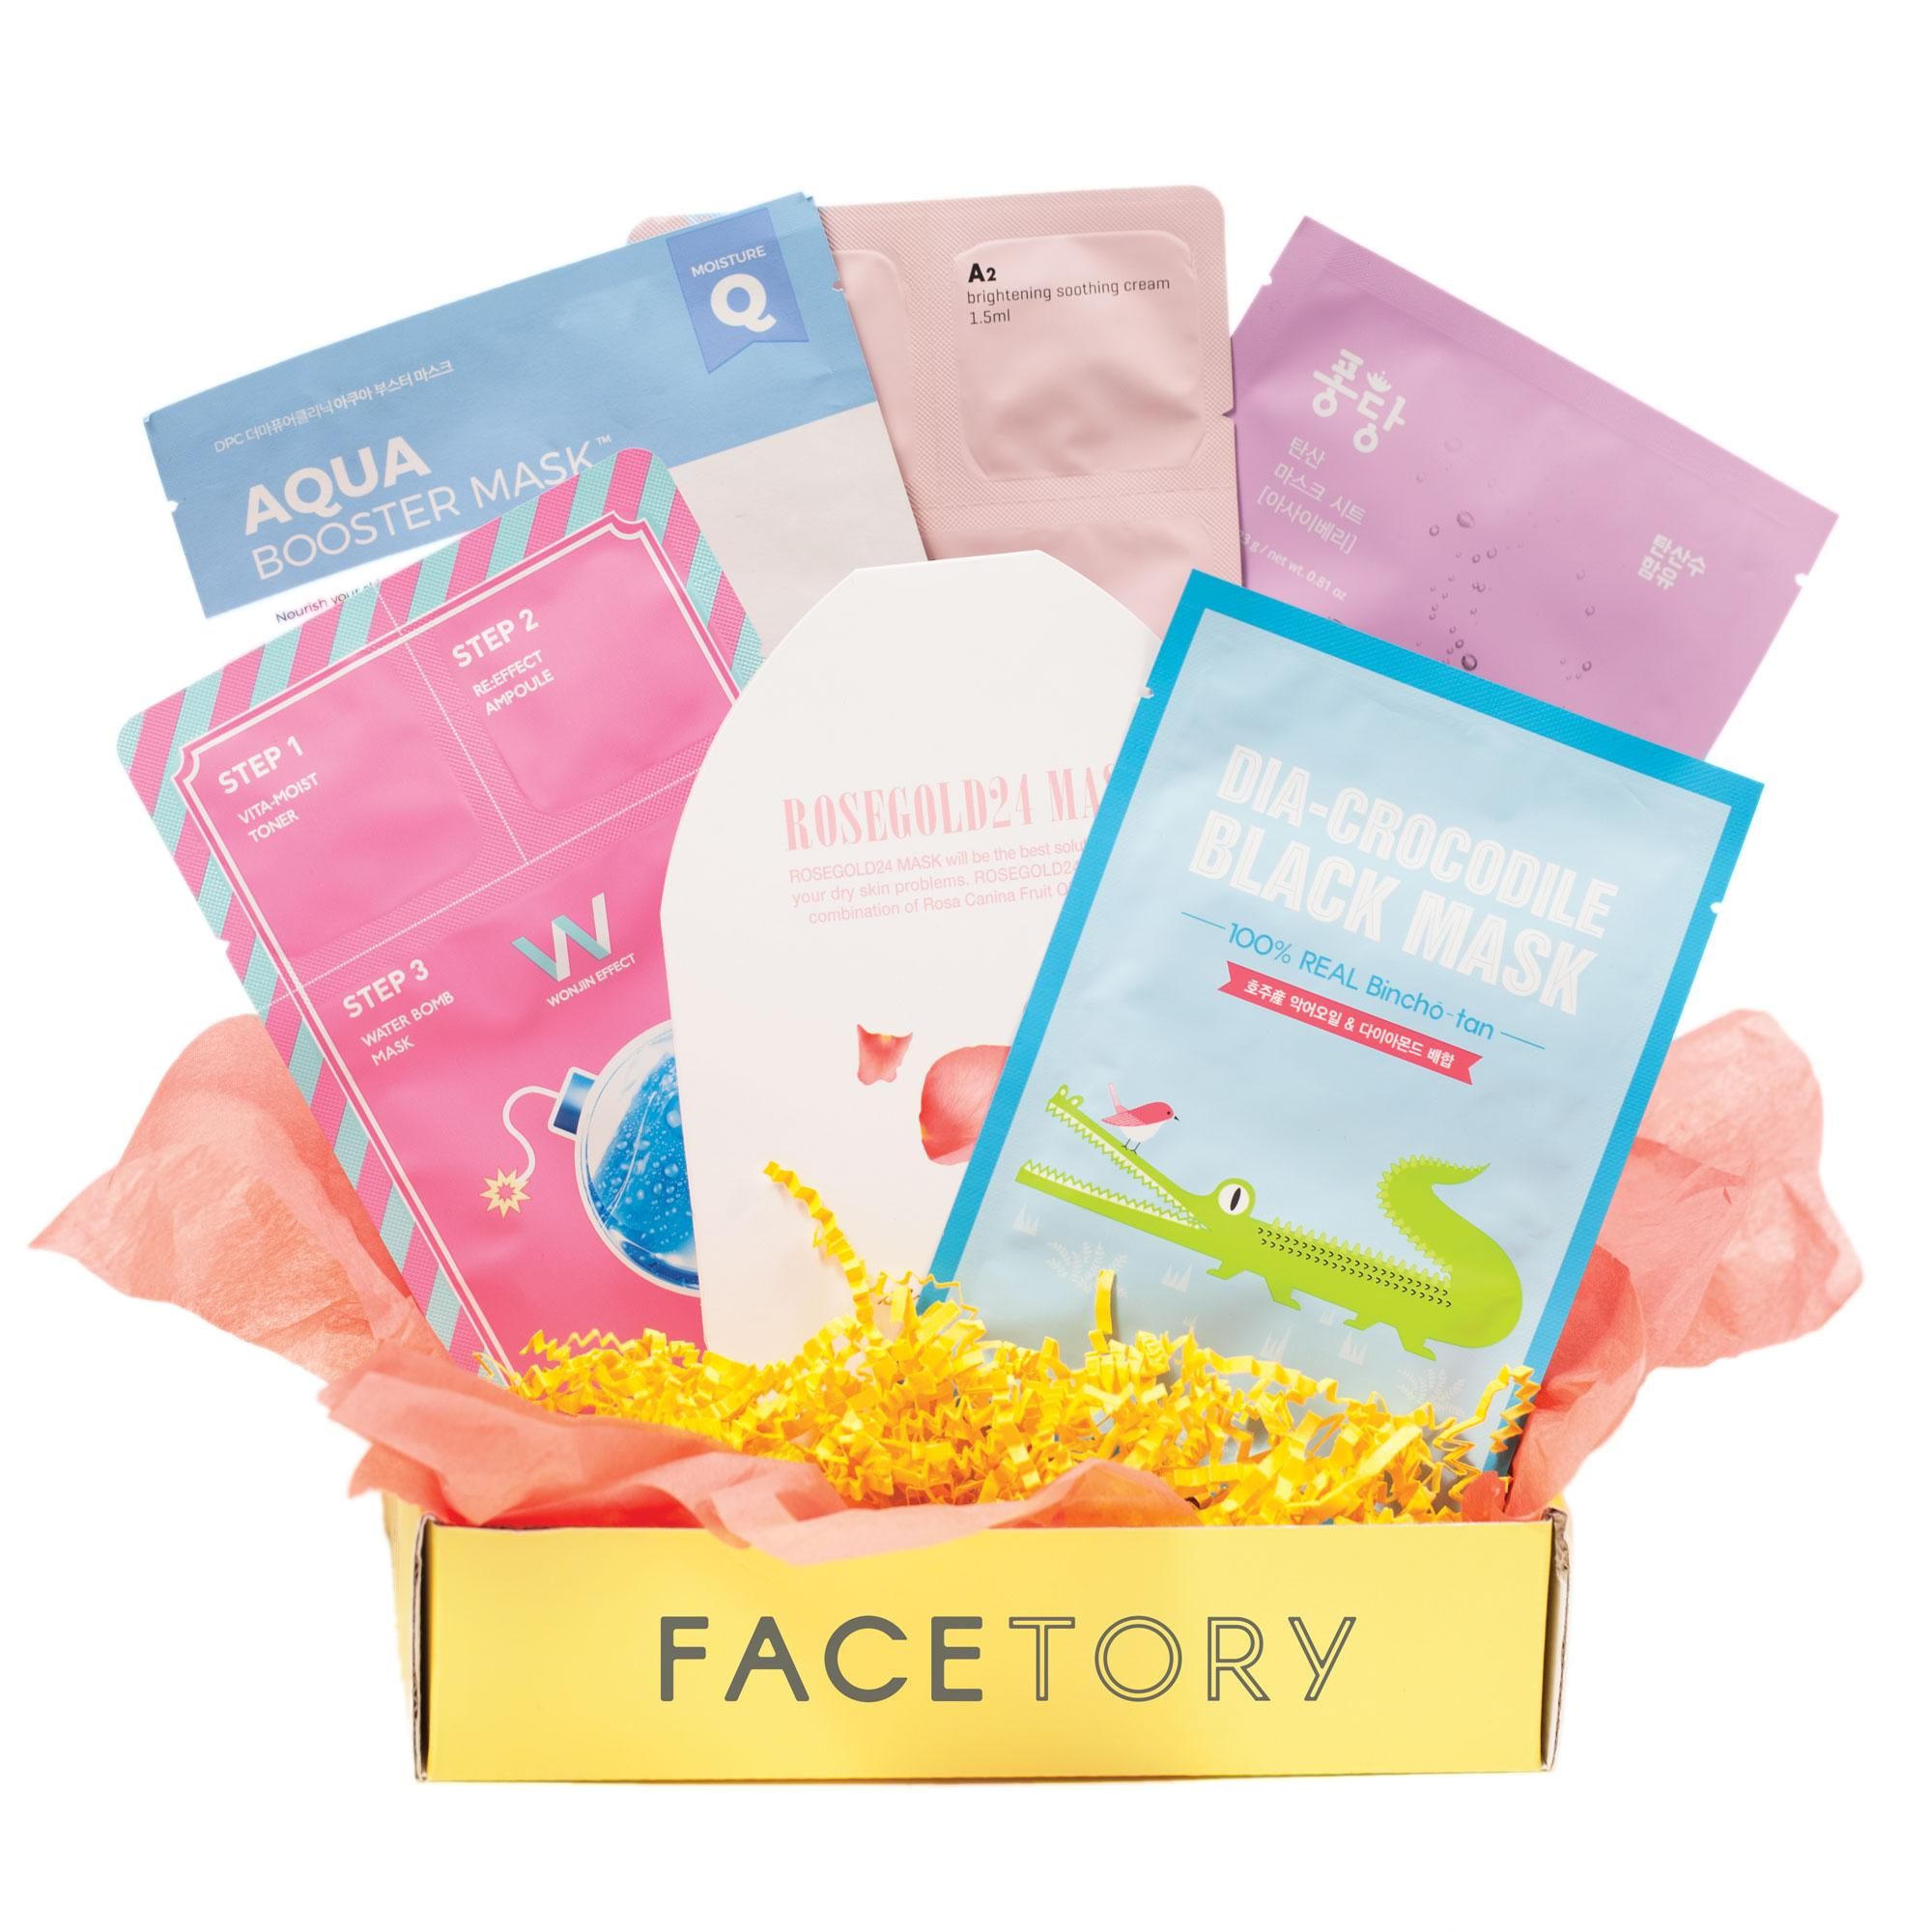 FaceTory - Handpicked Korean Sheet Masks Subscription Box: 4-Ever Fresh